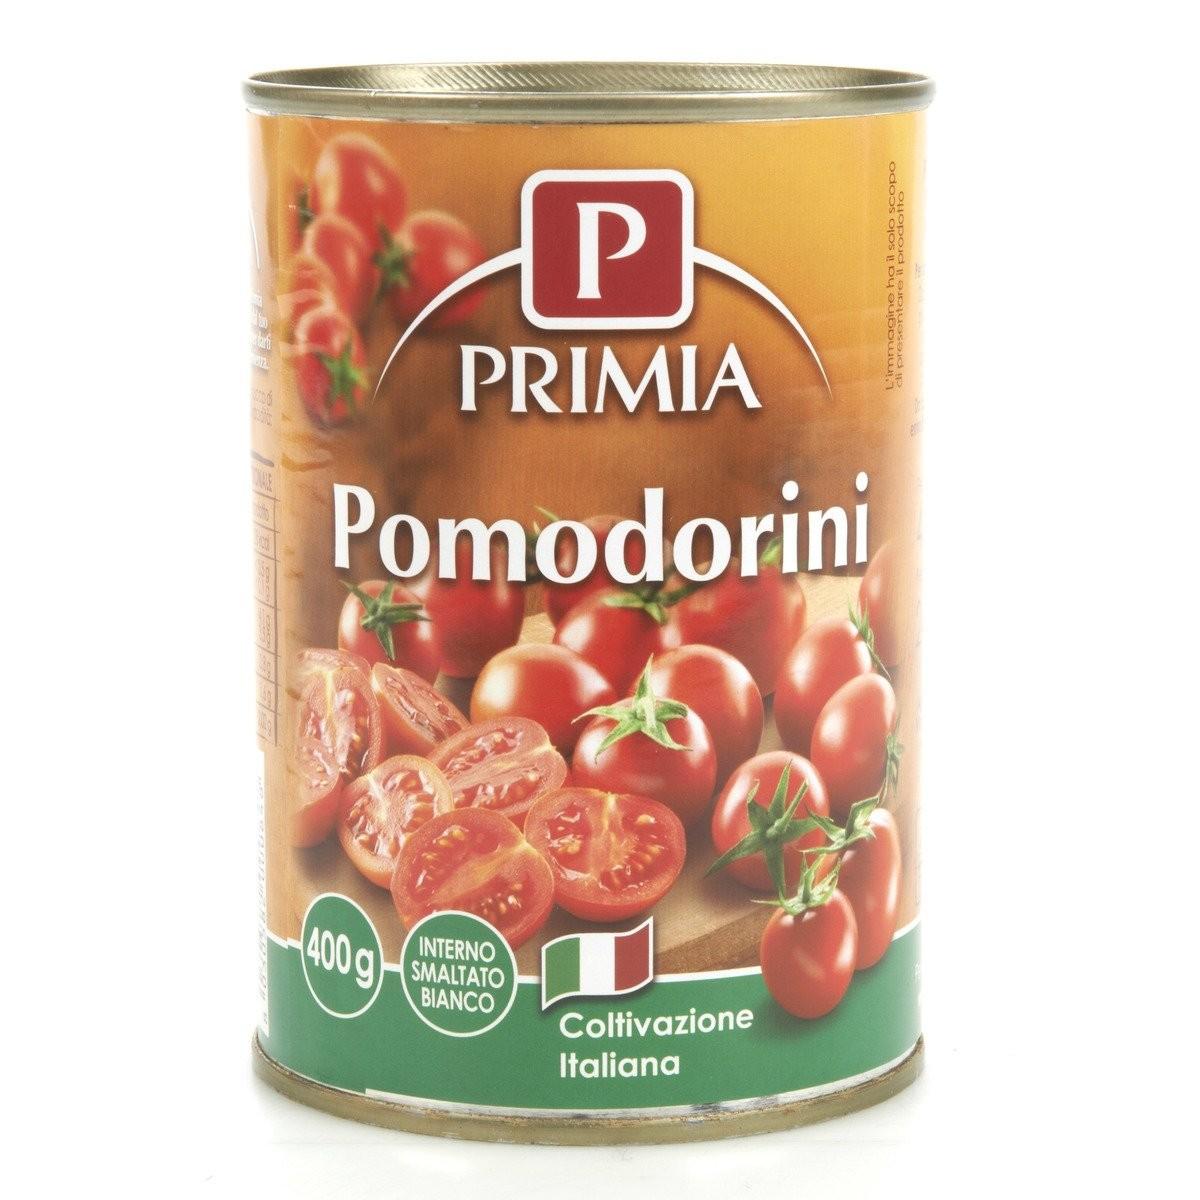 Primia Pomodorini